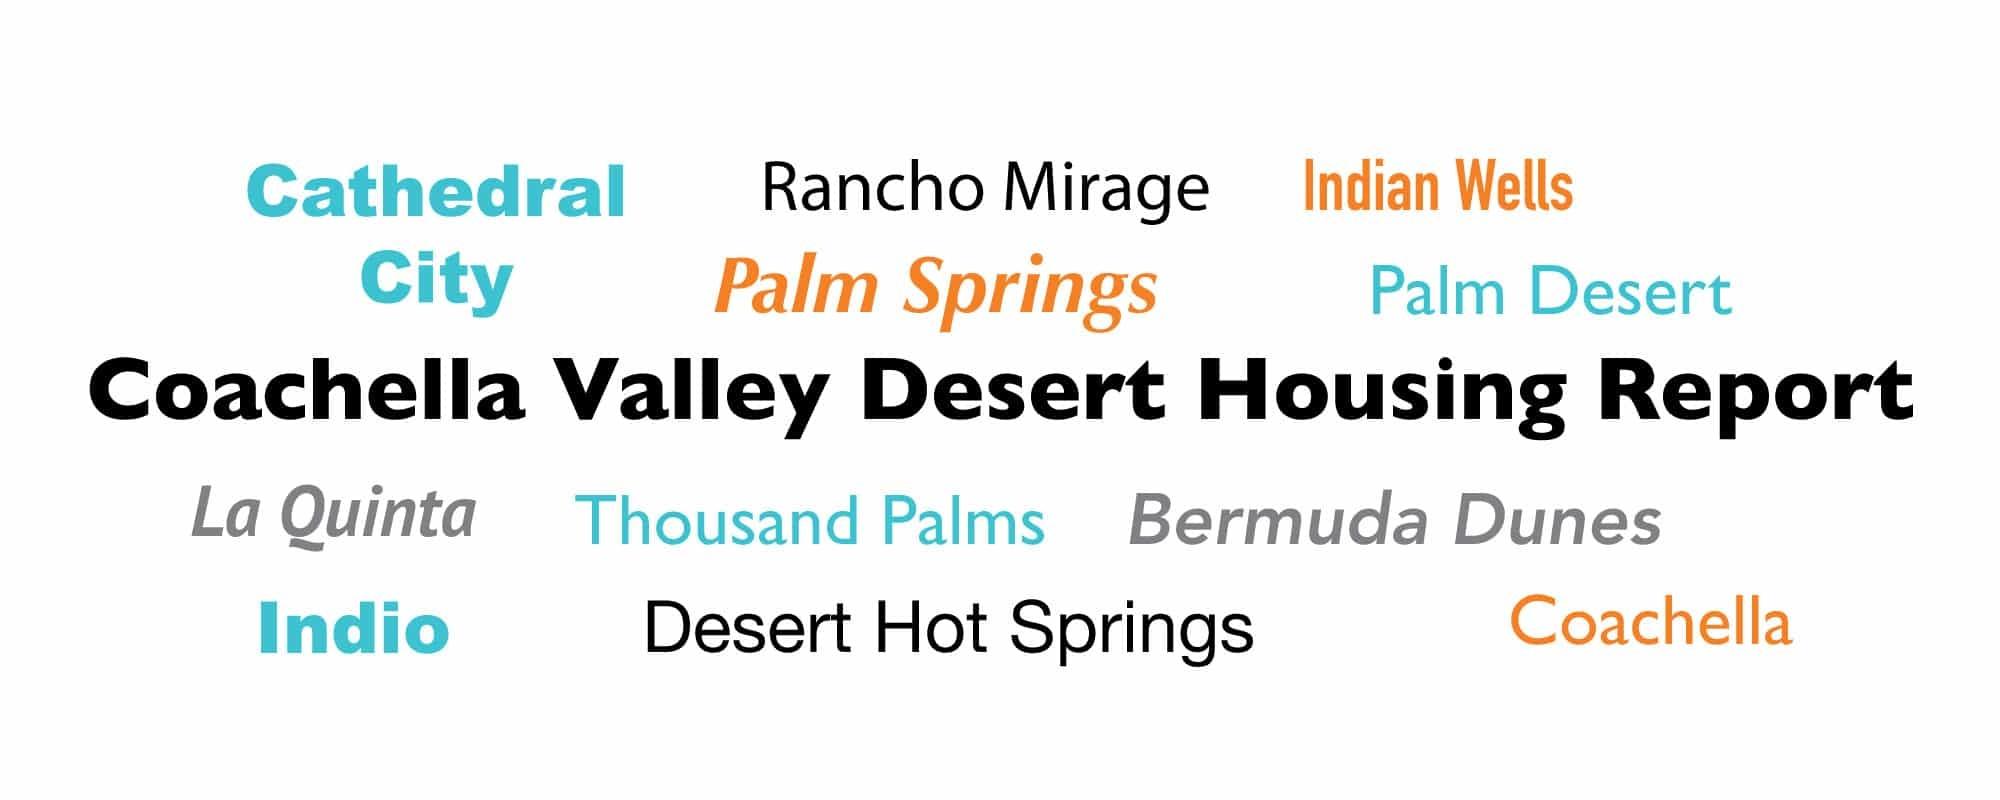 Palm Springs Rancho Mirage Palm Desert Coachella Valley Cities